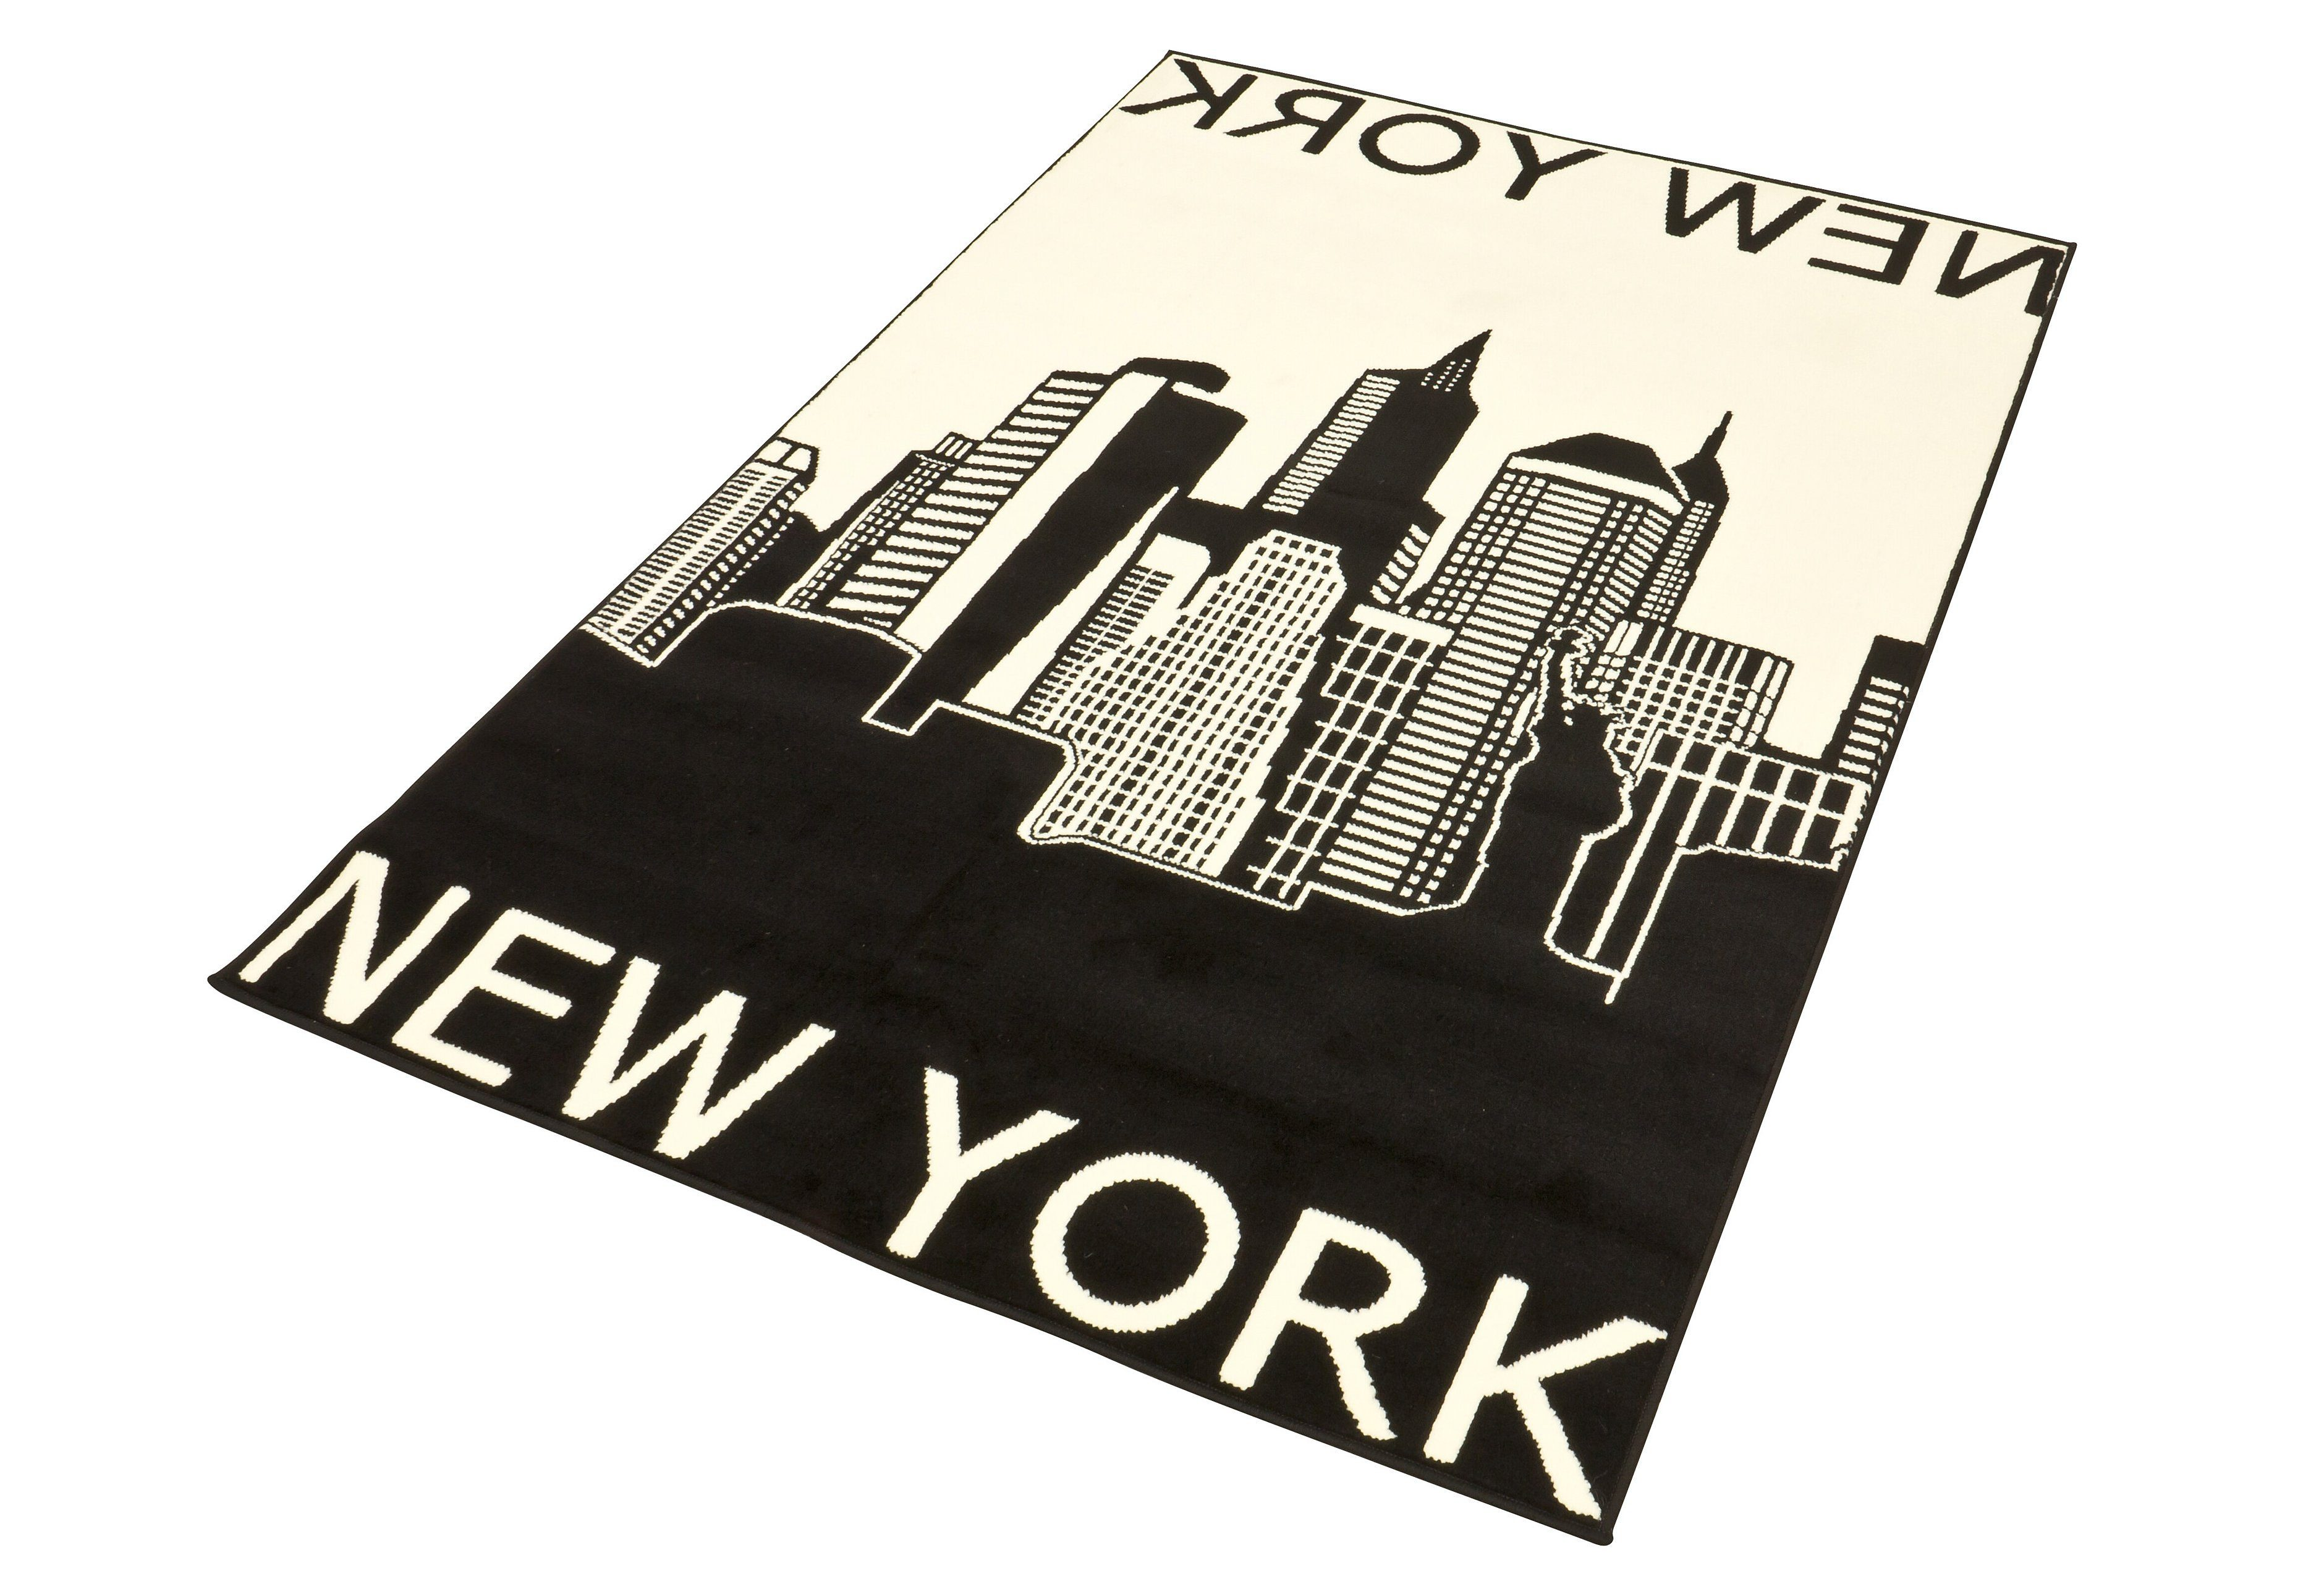 Designteppich »New York«, Hanse Home, rechteckig, Höhe 9 mm, New York Skyline Motiv